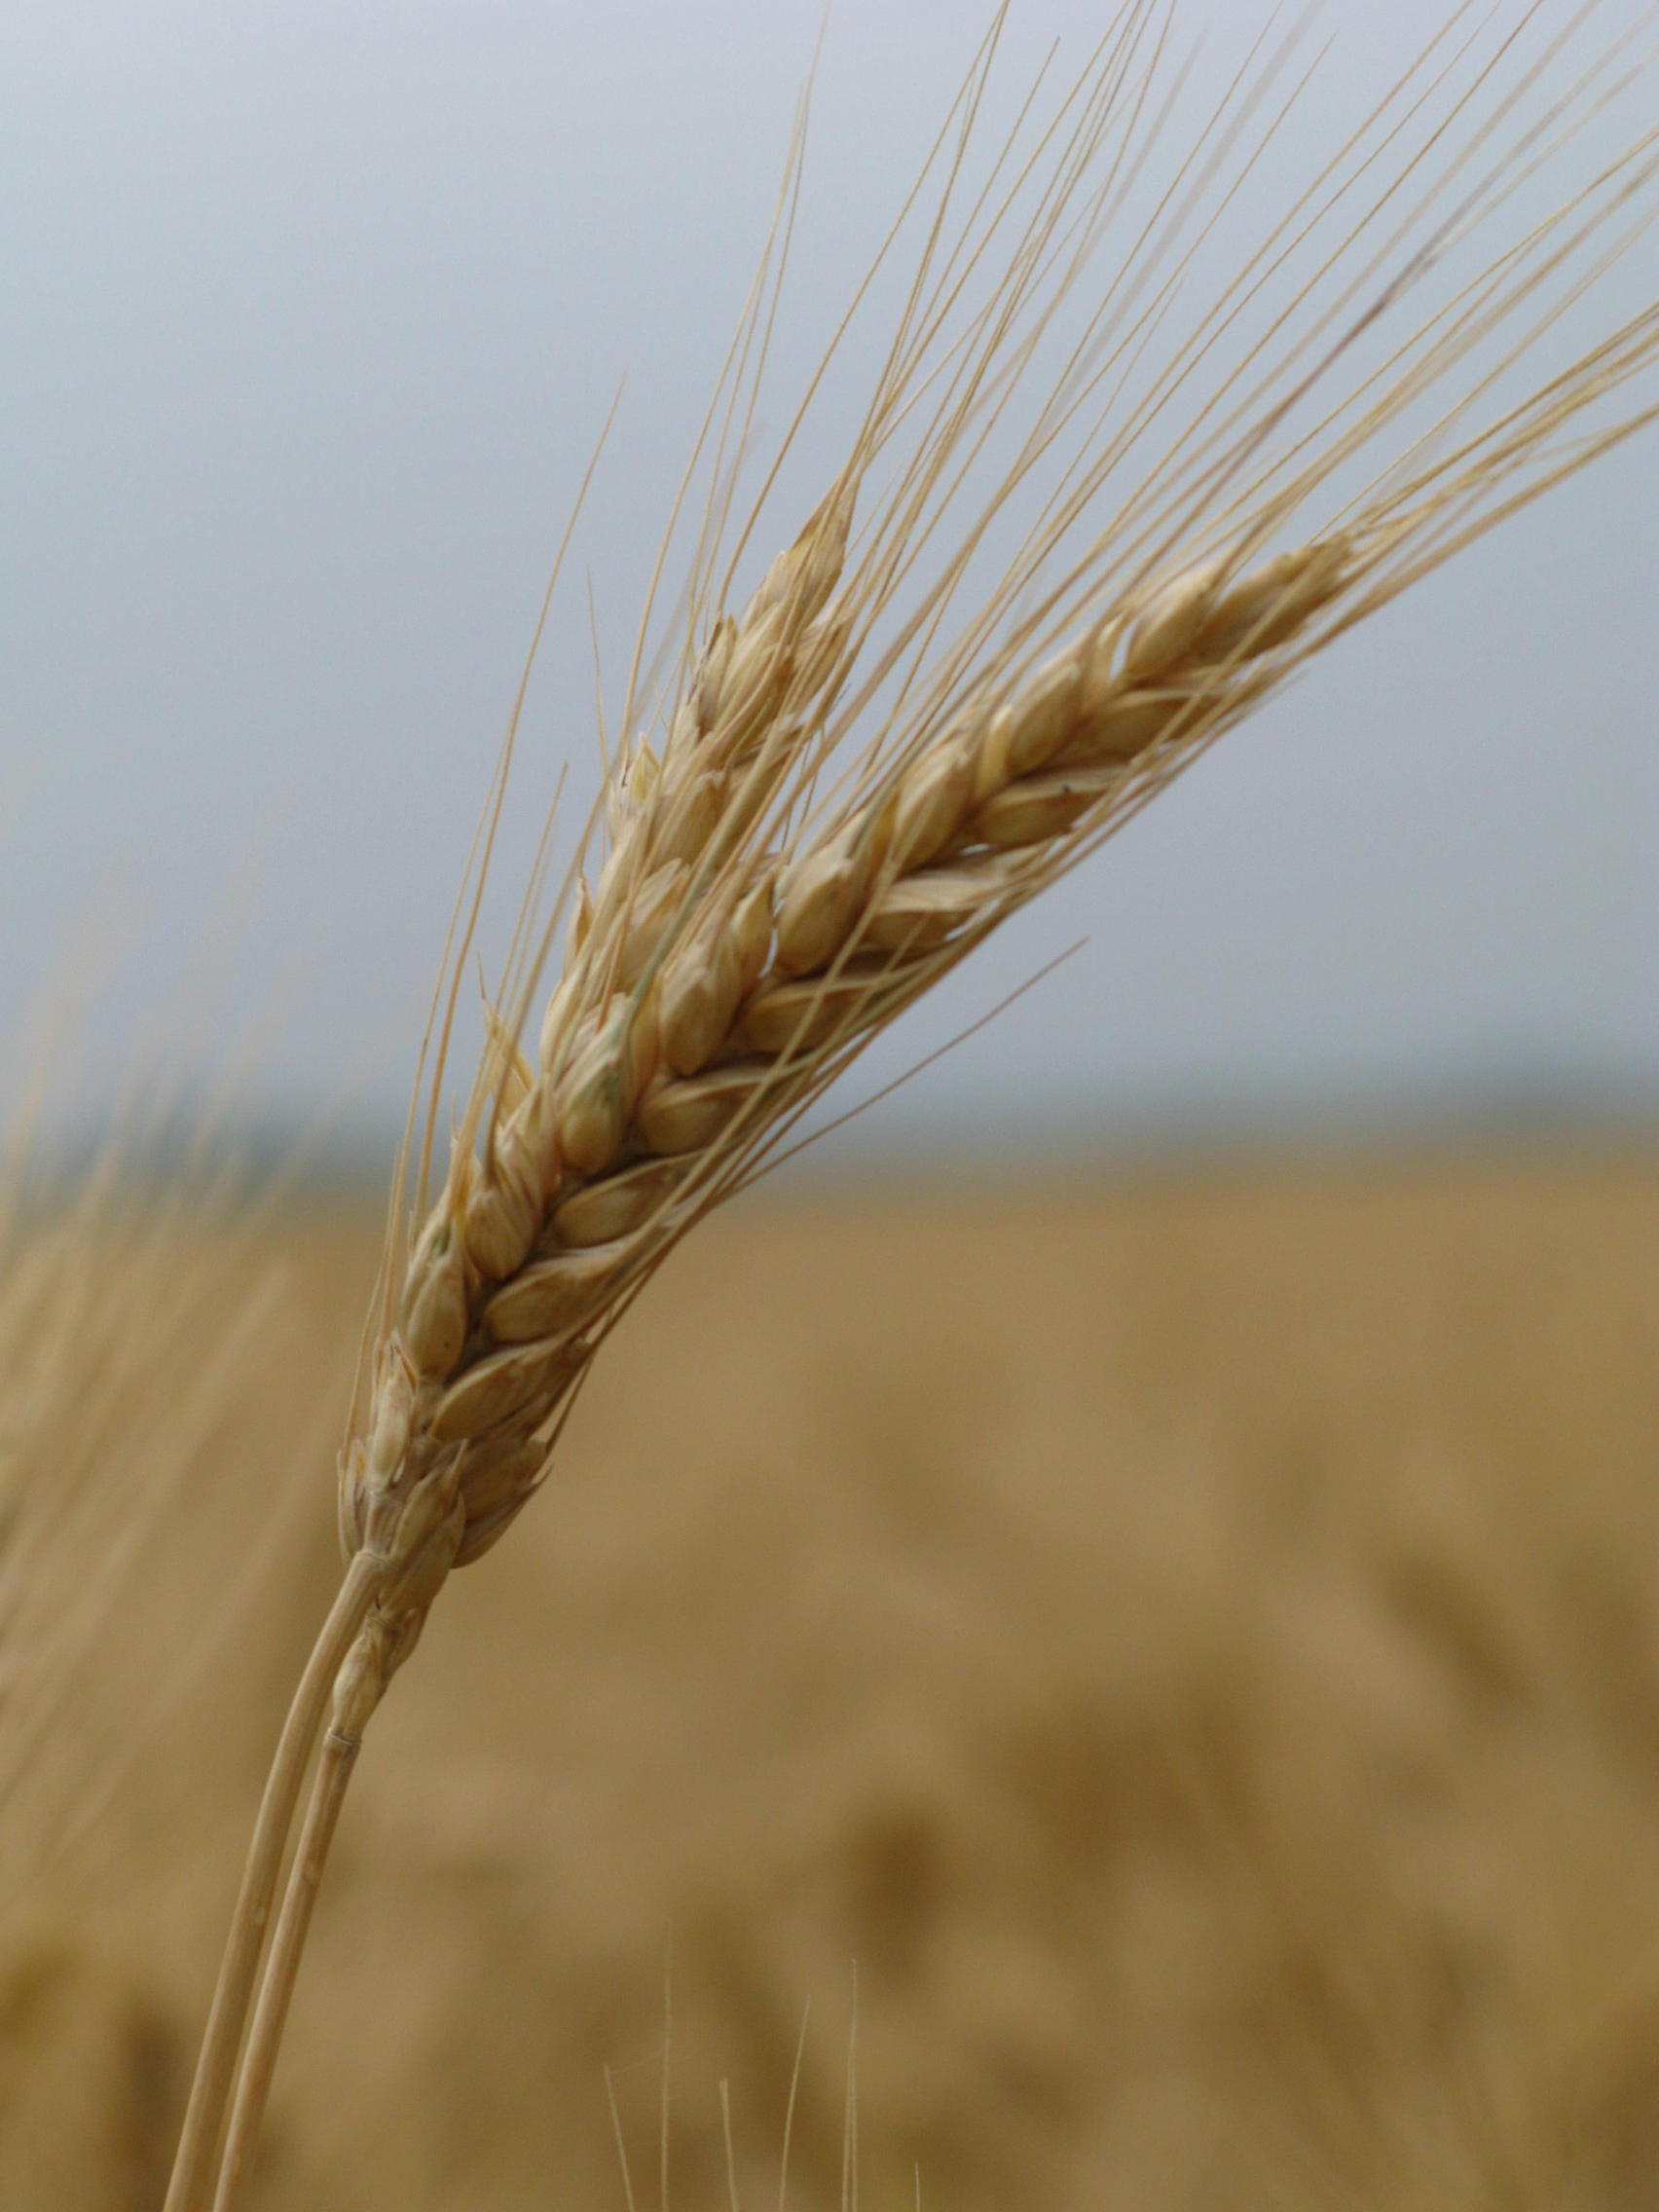 tfb_wheat_1492